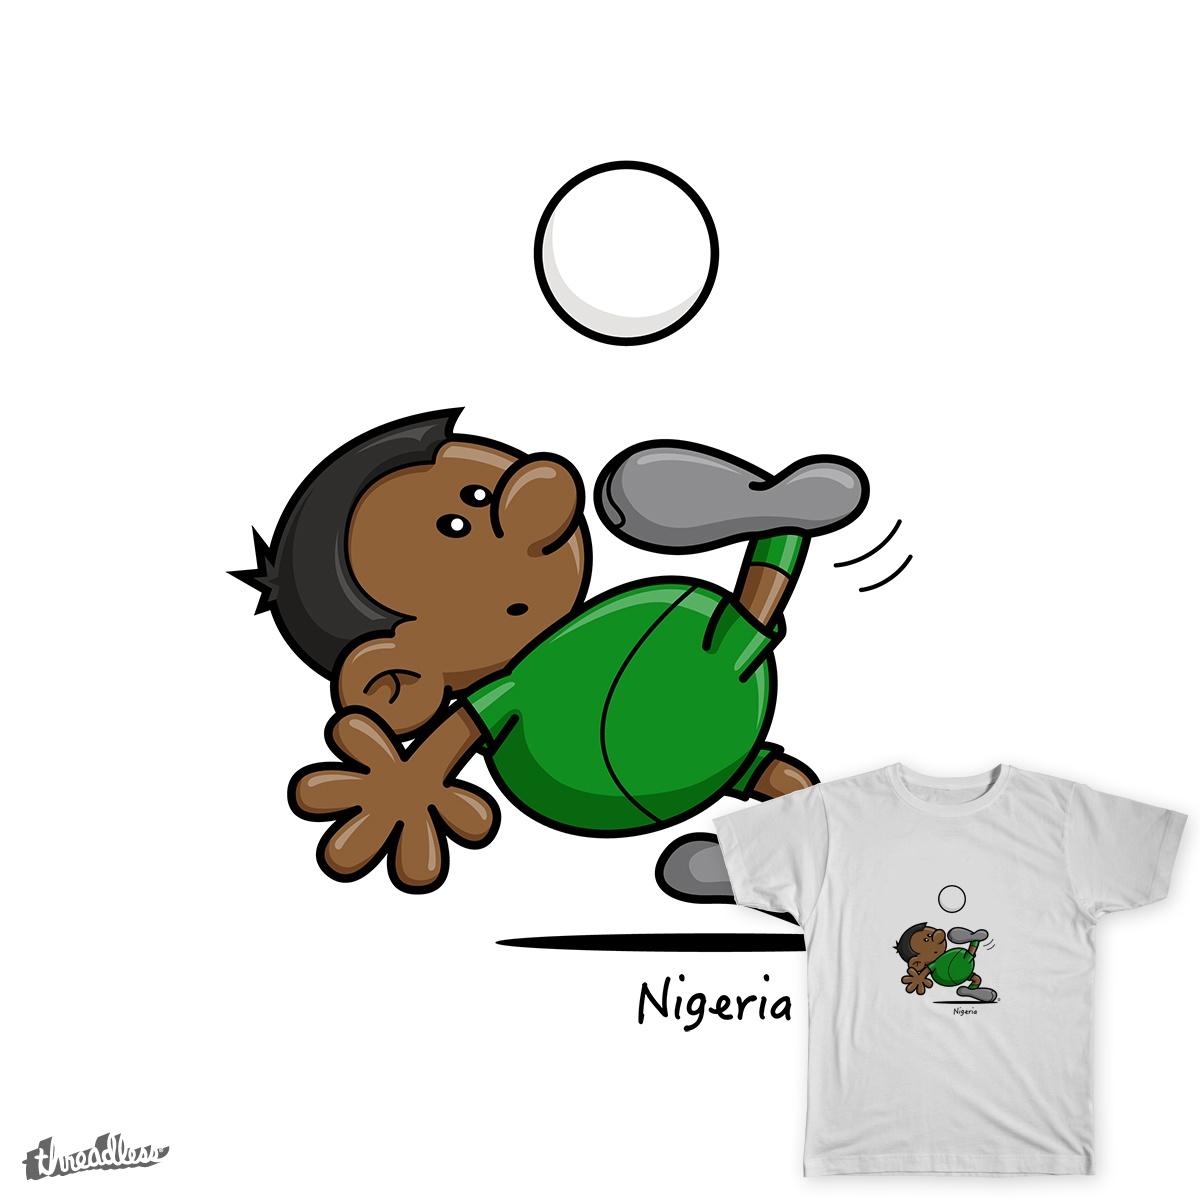 2014 World Cup Cartoons - Nigeria by spaghettiarts on Threadless